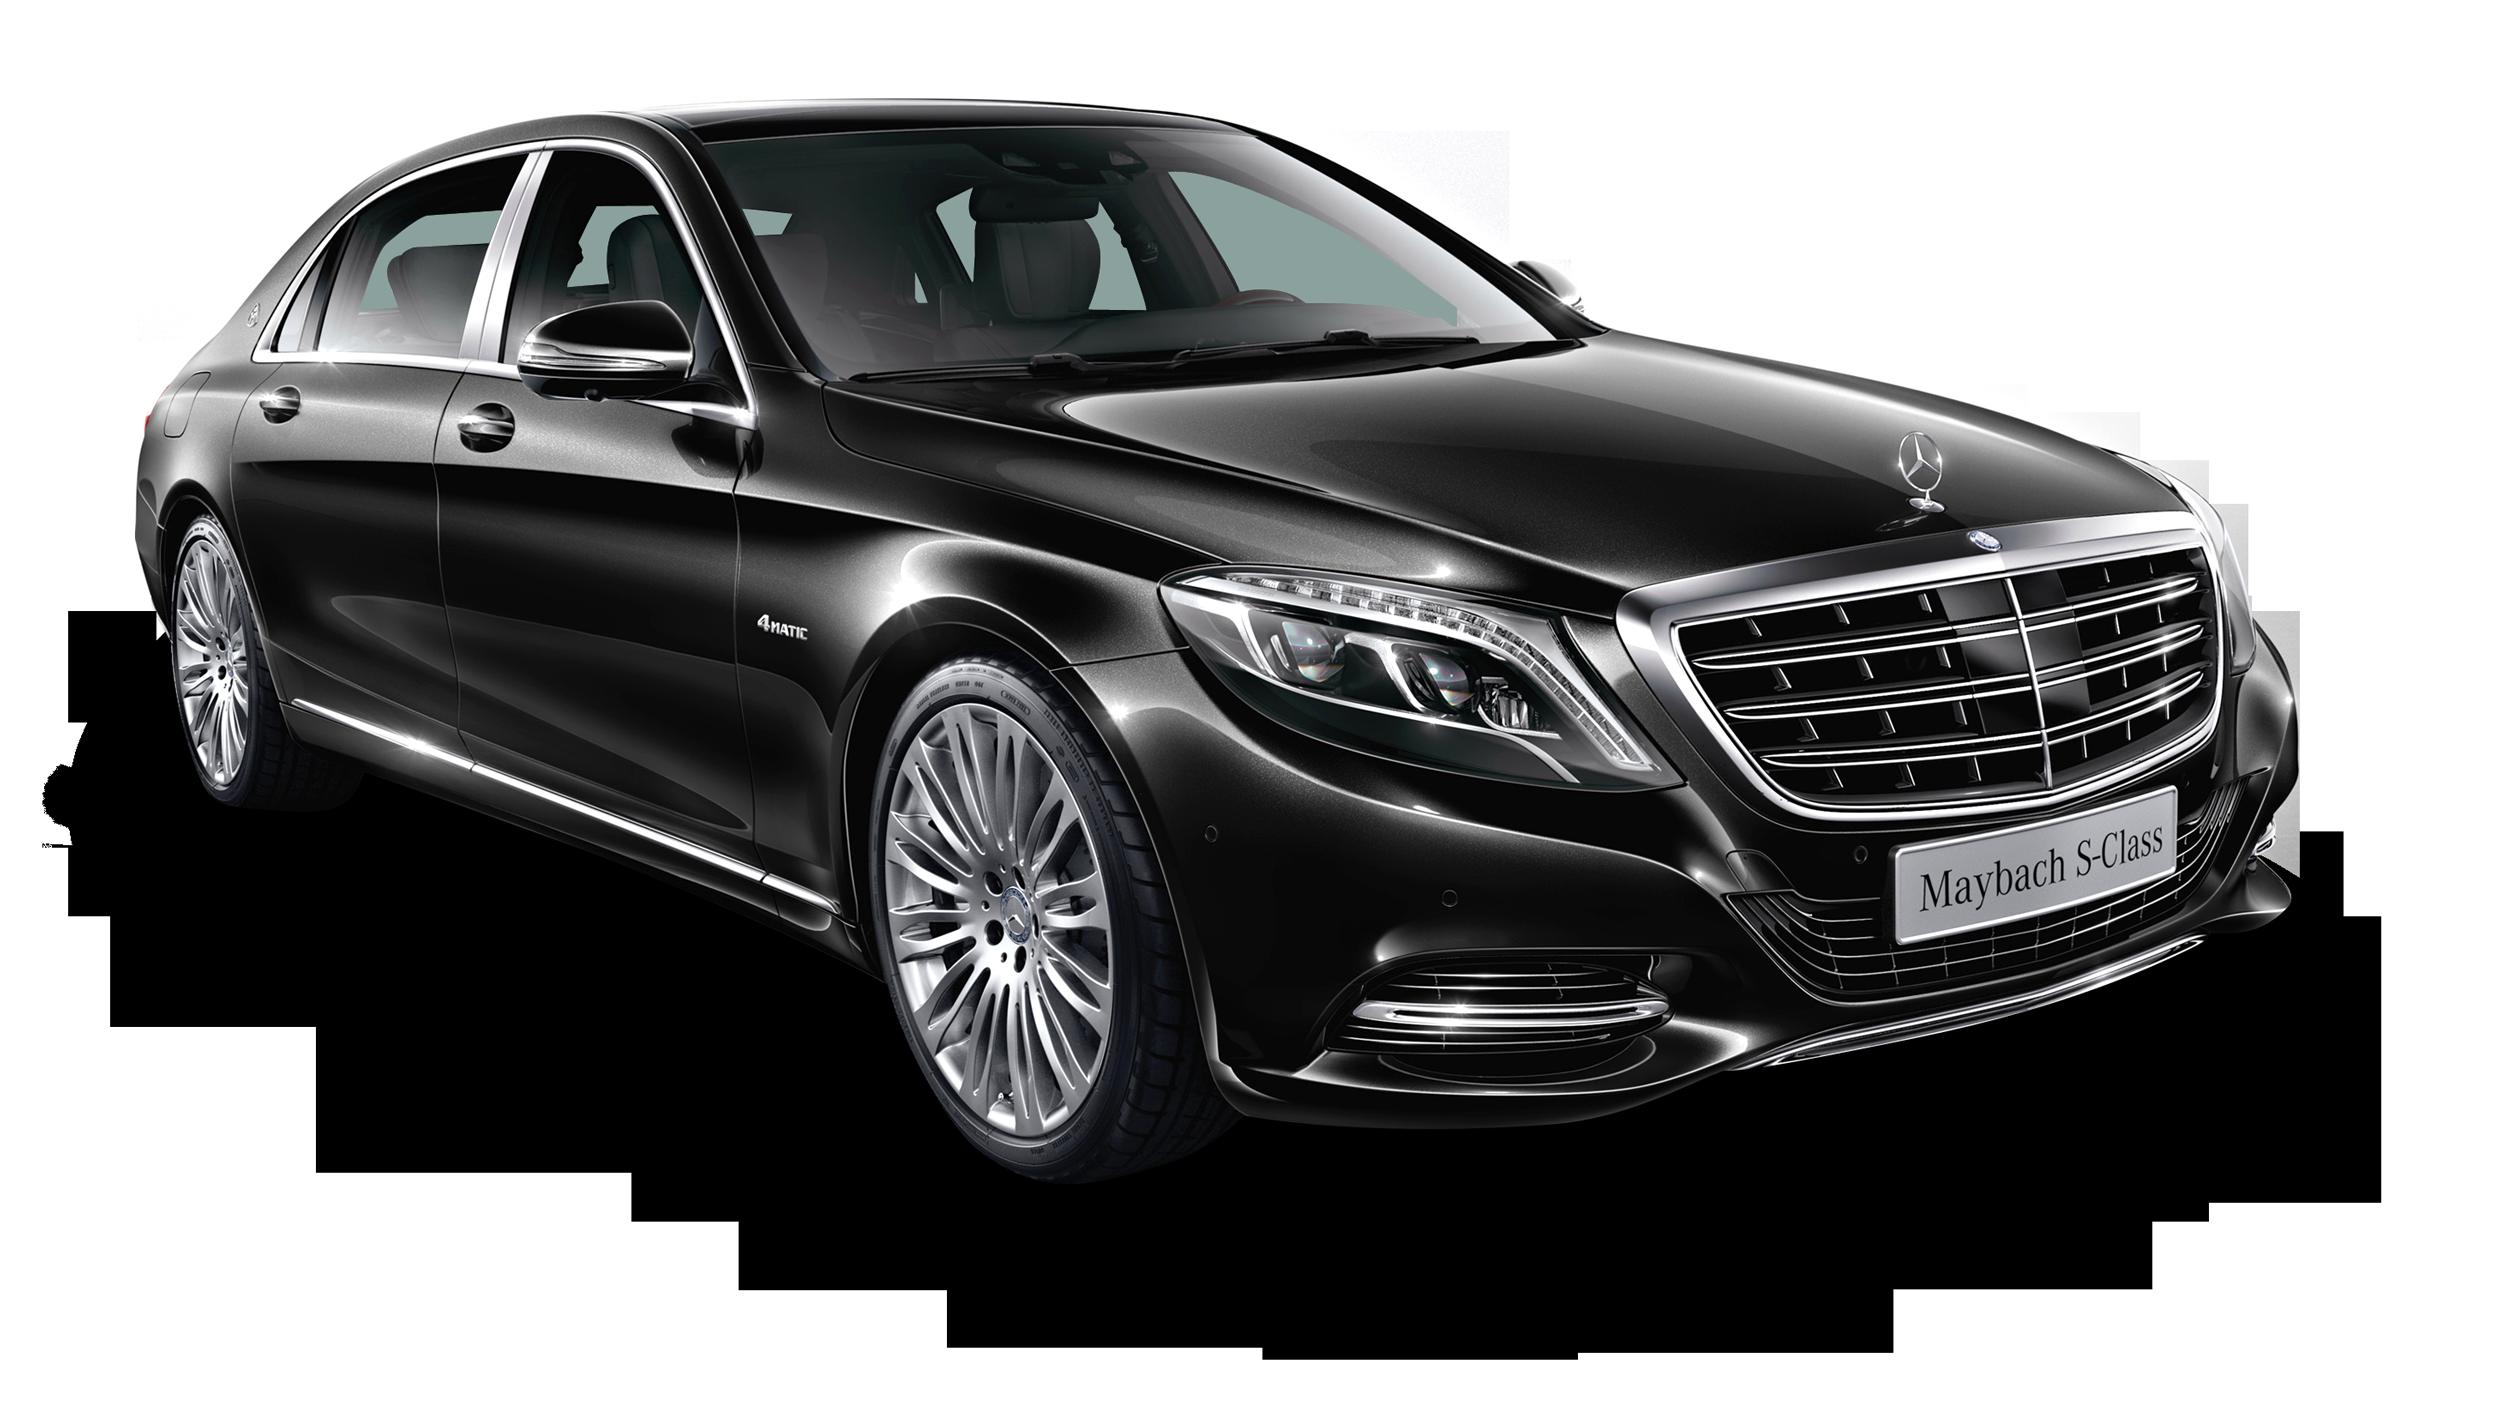 Mercedes S Class Black